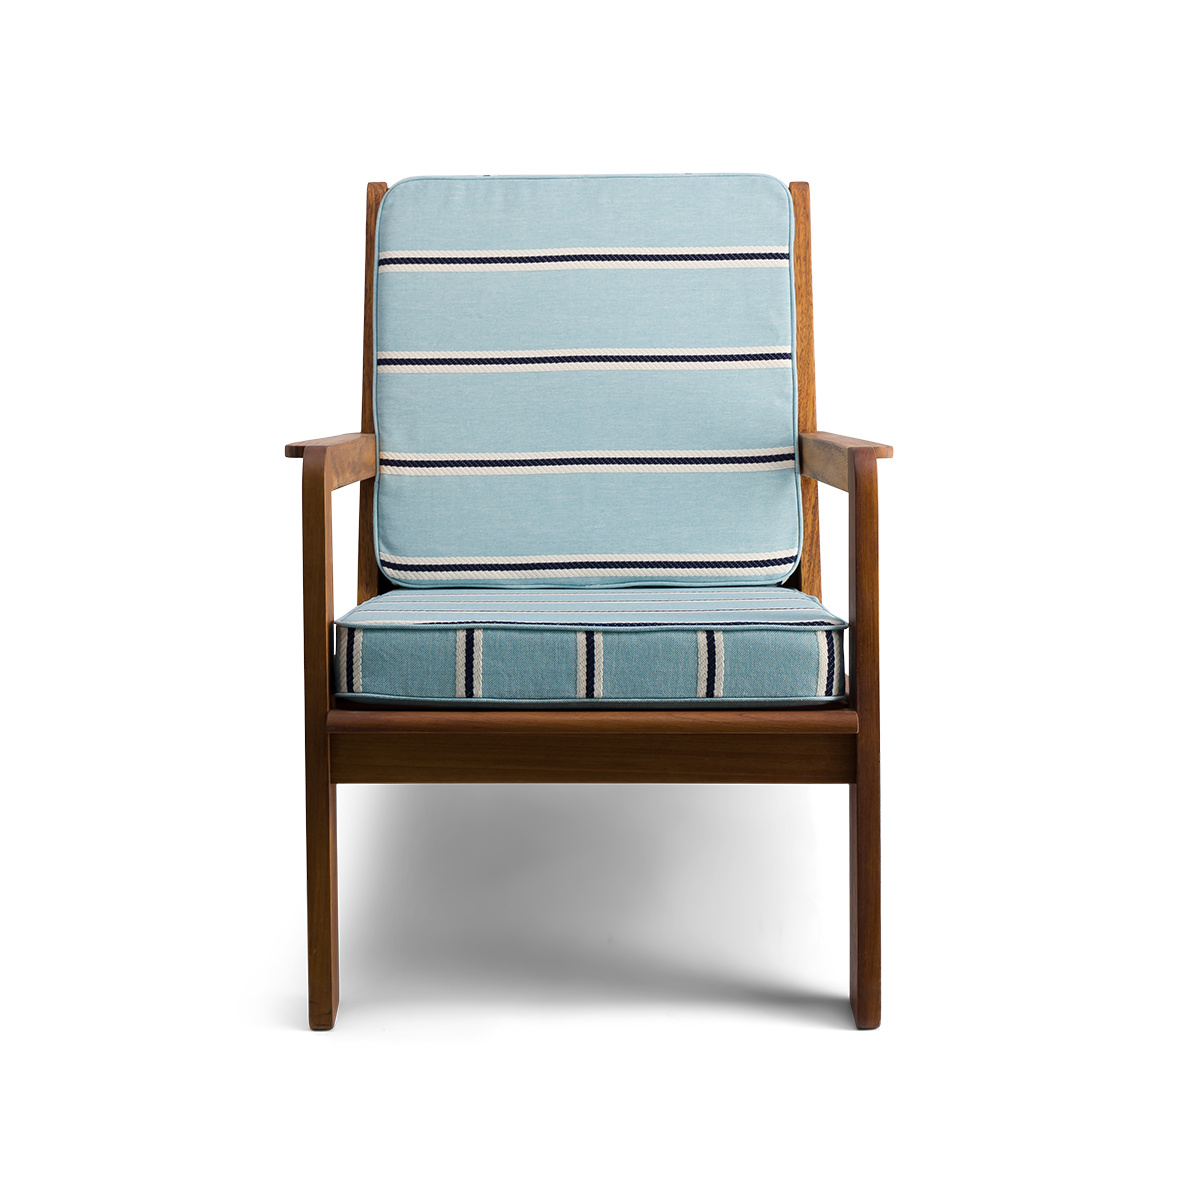 Gloria fireside chair brown wood, striped light blue Dedar fabric